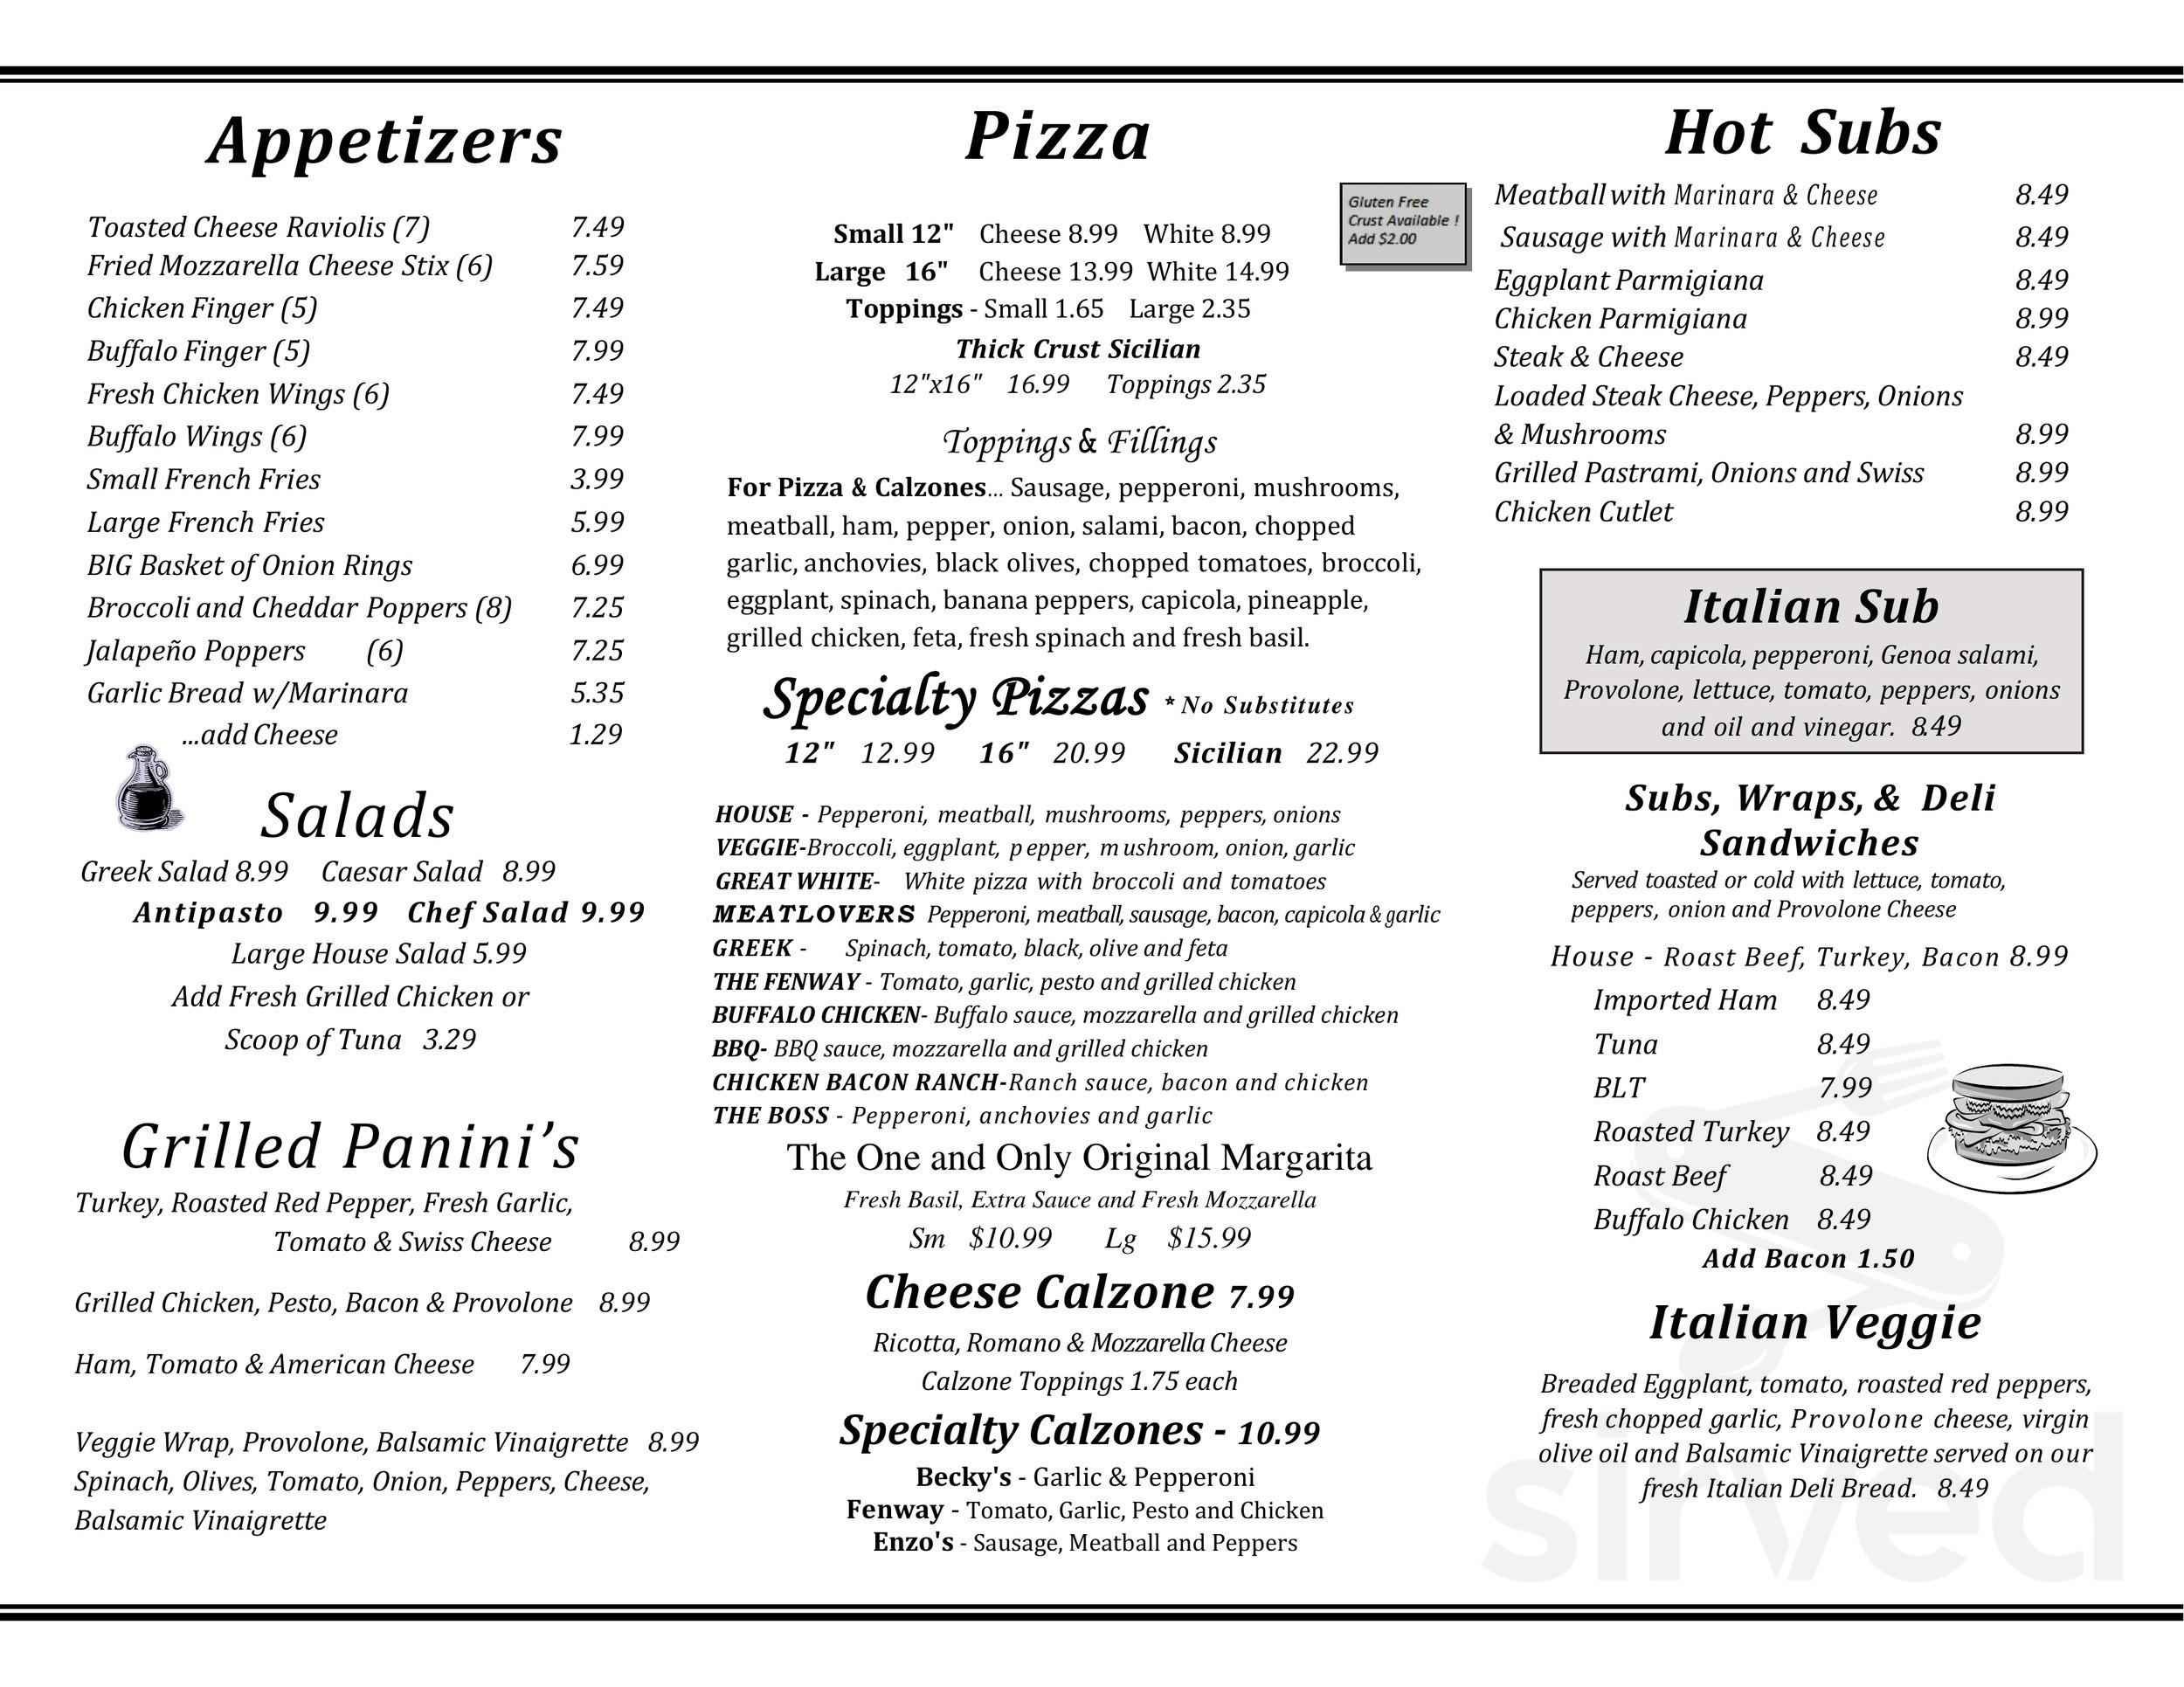 Menu For Enzo S Pizzeria Restaurant In Lincoln New Hampshire